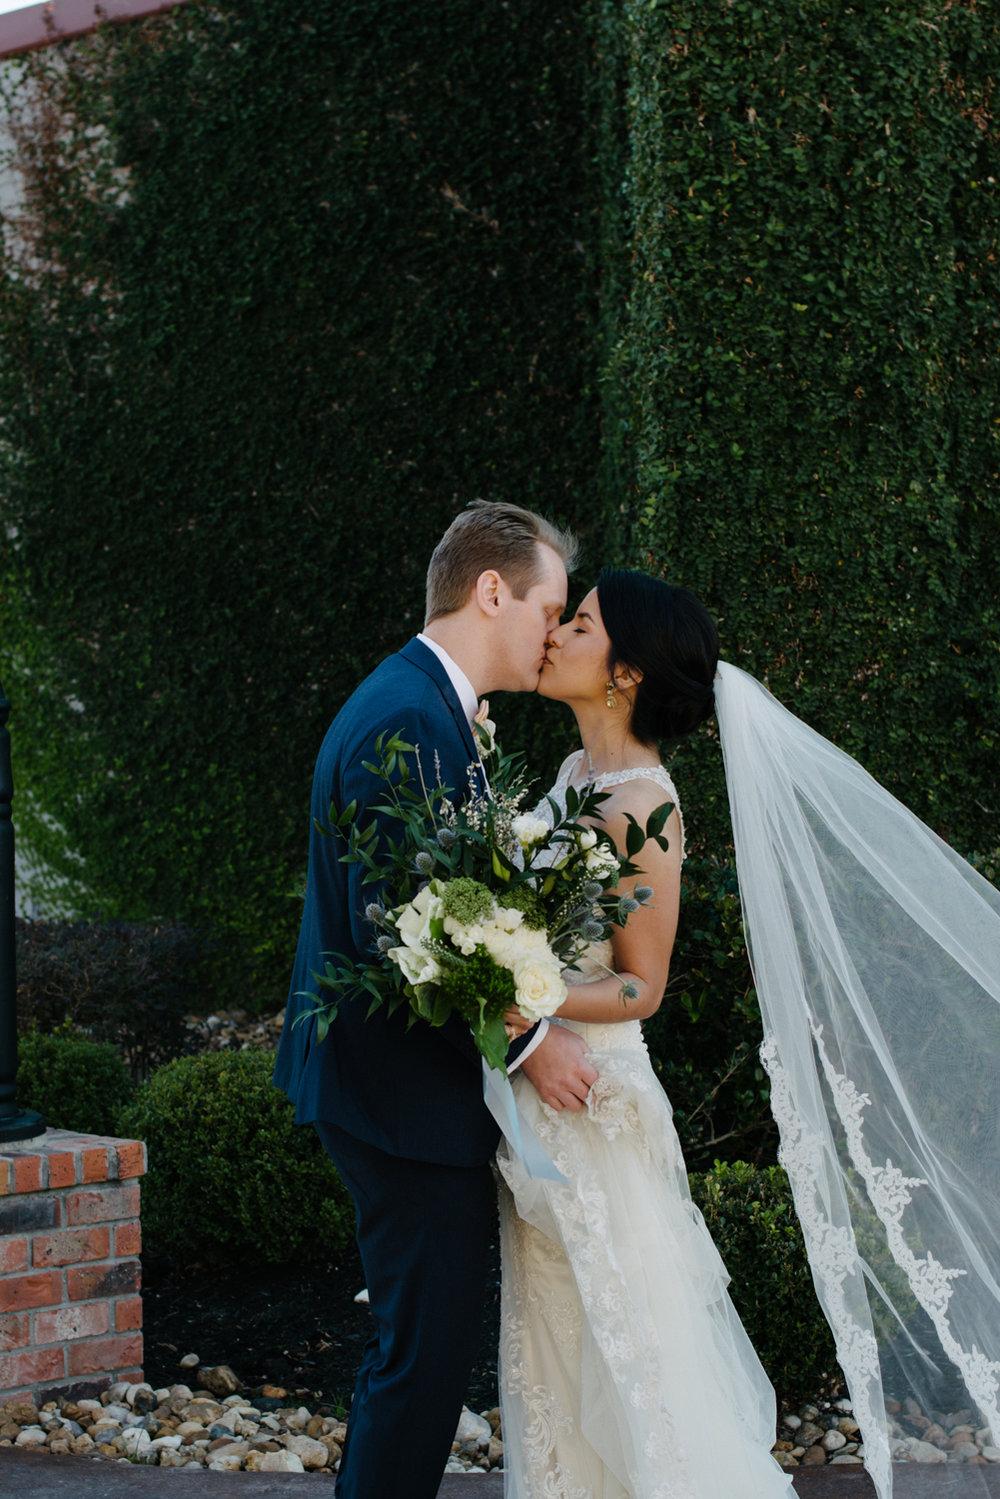 casperwedding-texasweddings-houstonweddings-oldedobbestation-montgomerytx-montgomeryweddings-bride-groom-bridalparty-weddingdress-56.jpg